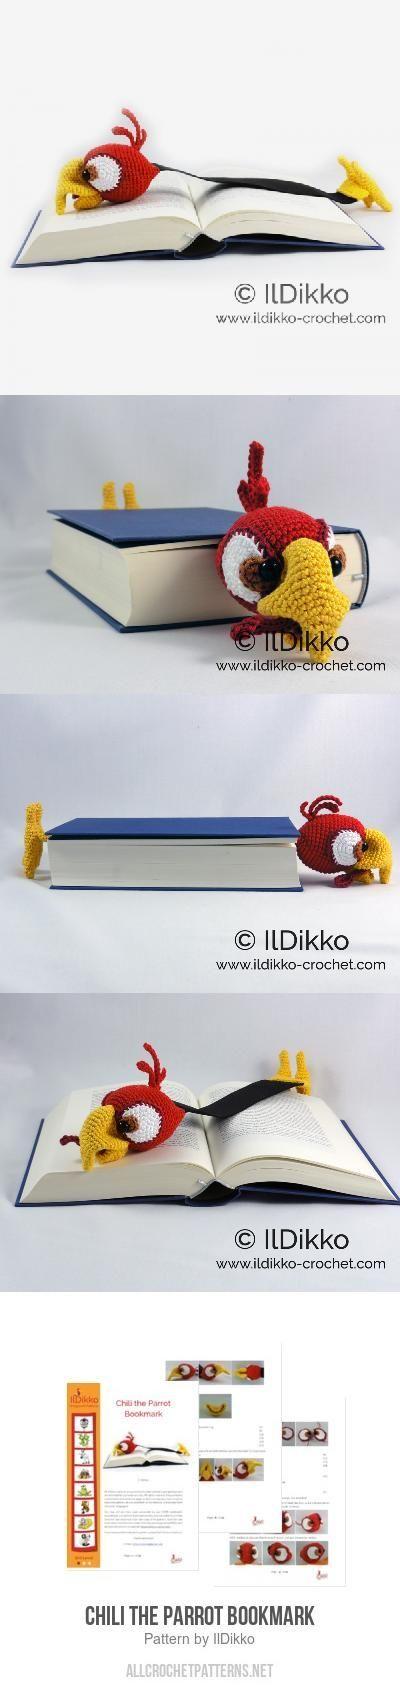 Chili the Parrot Bookmark crochet pattern by IlDikko | Tejido ...